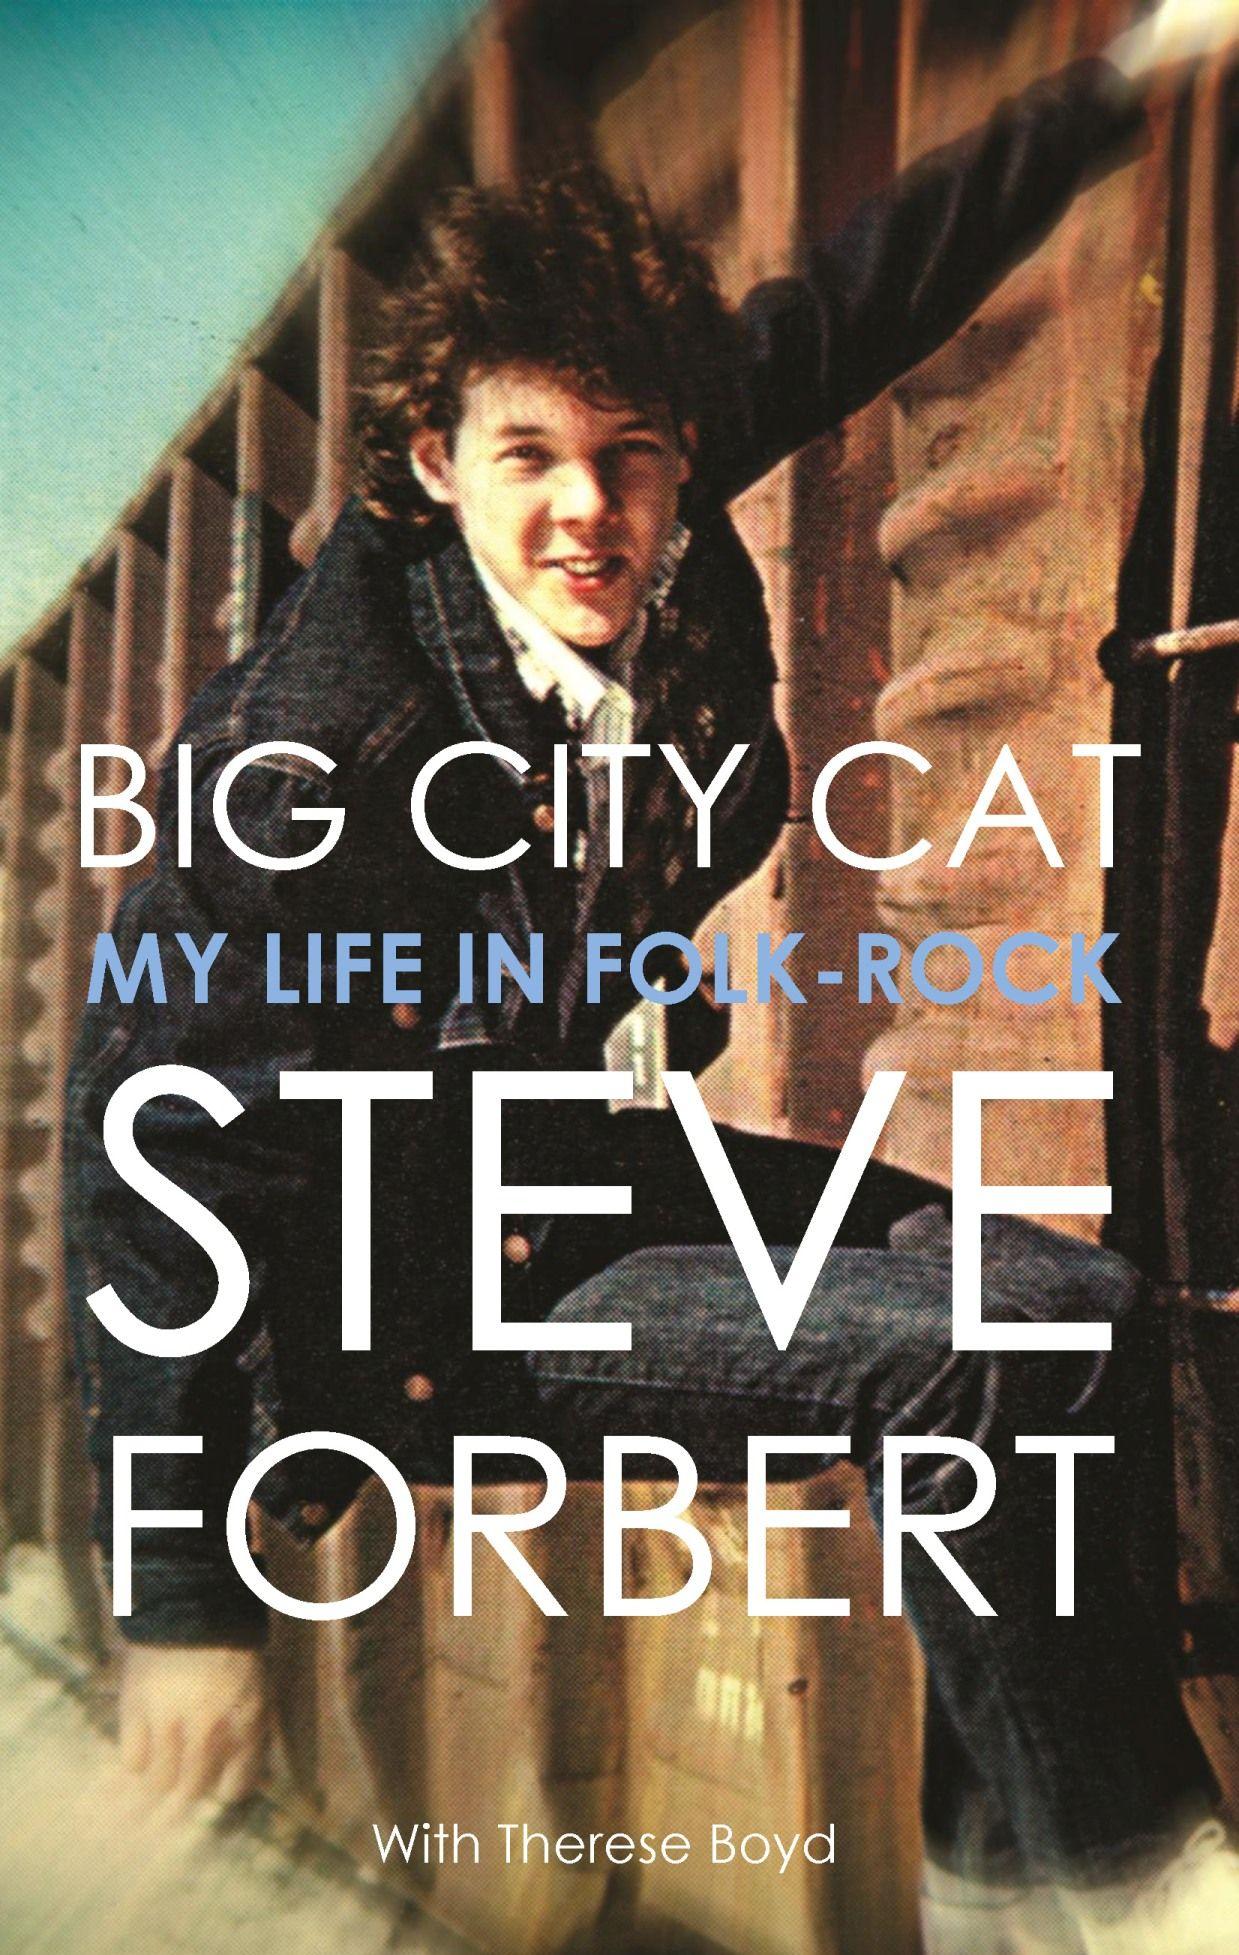 Big City Cat Steve Forbert